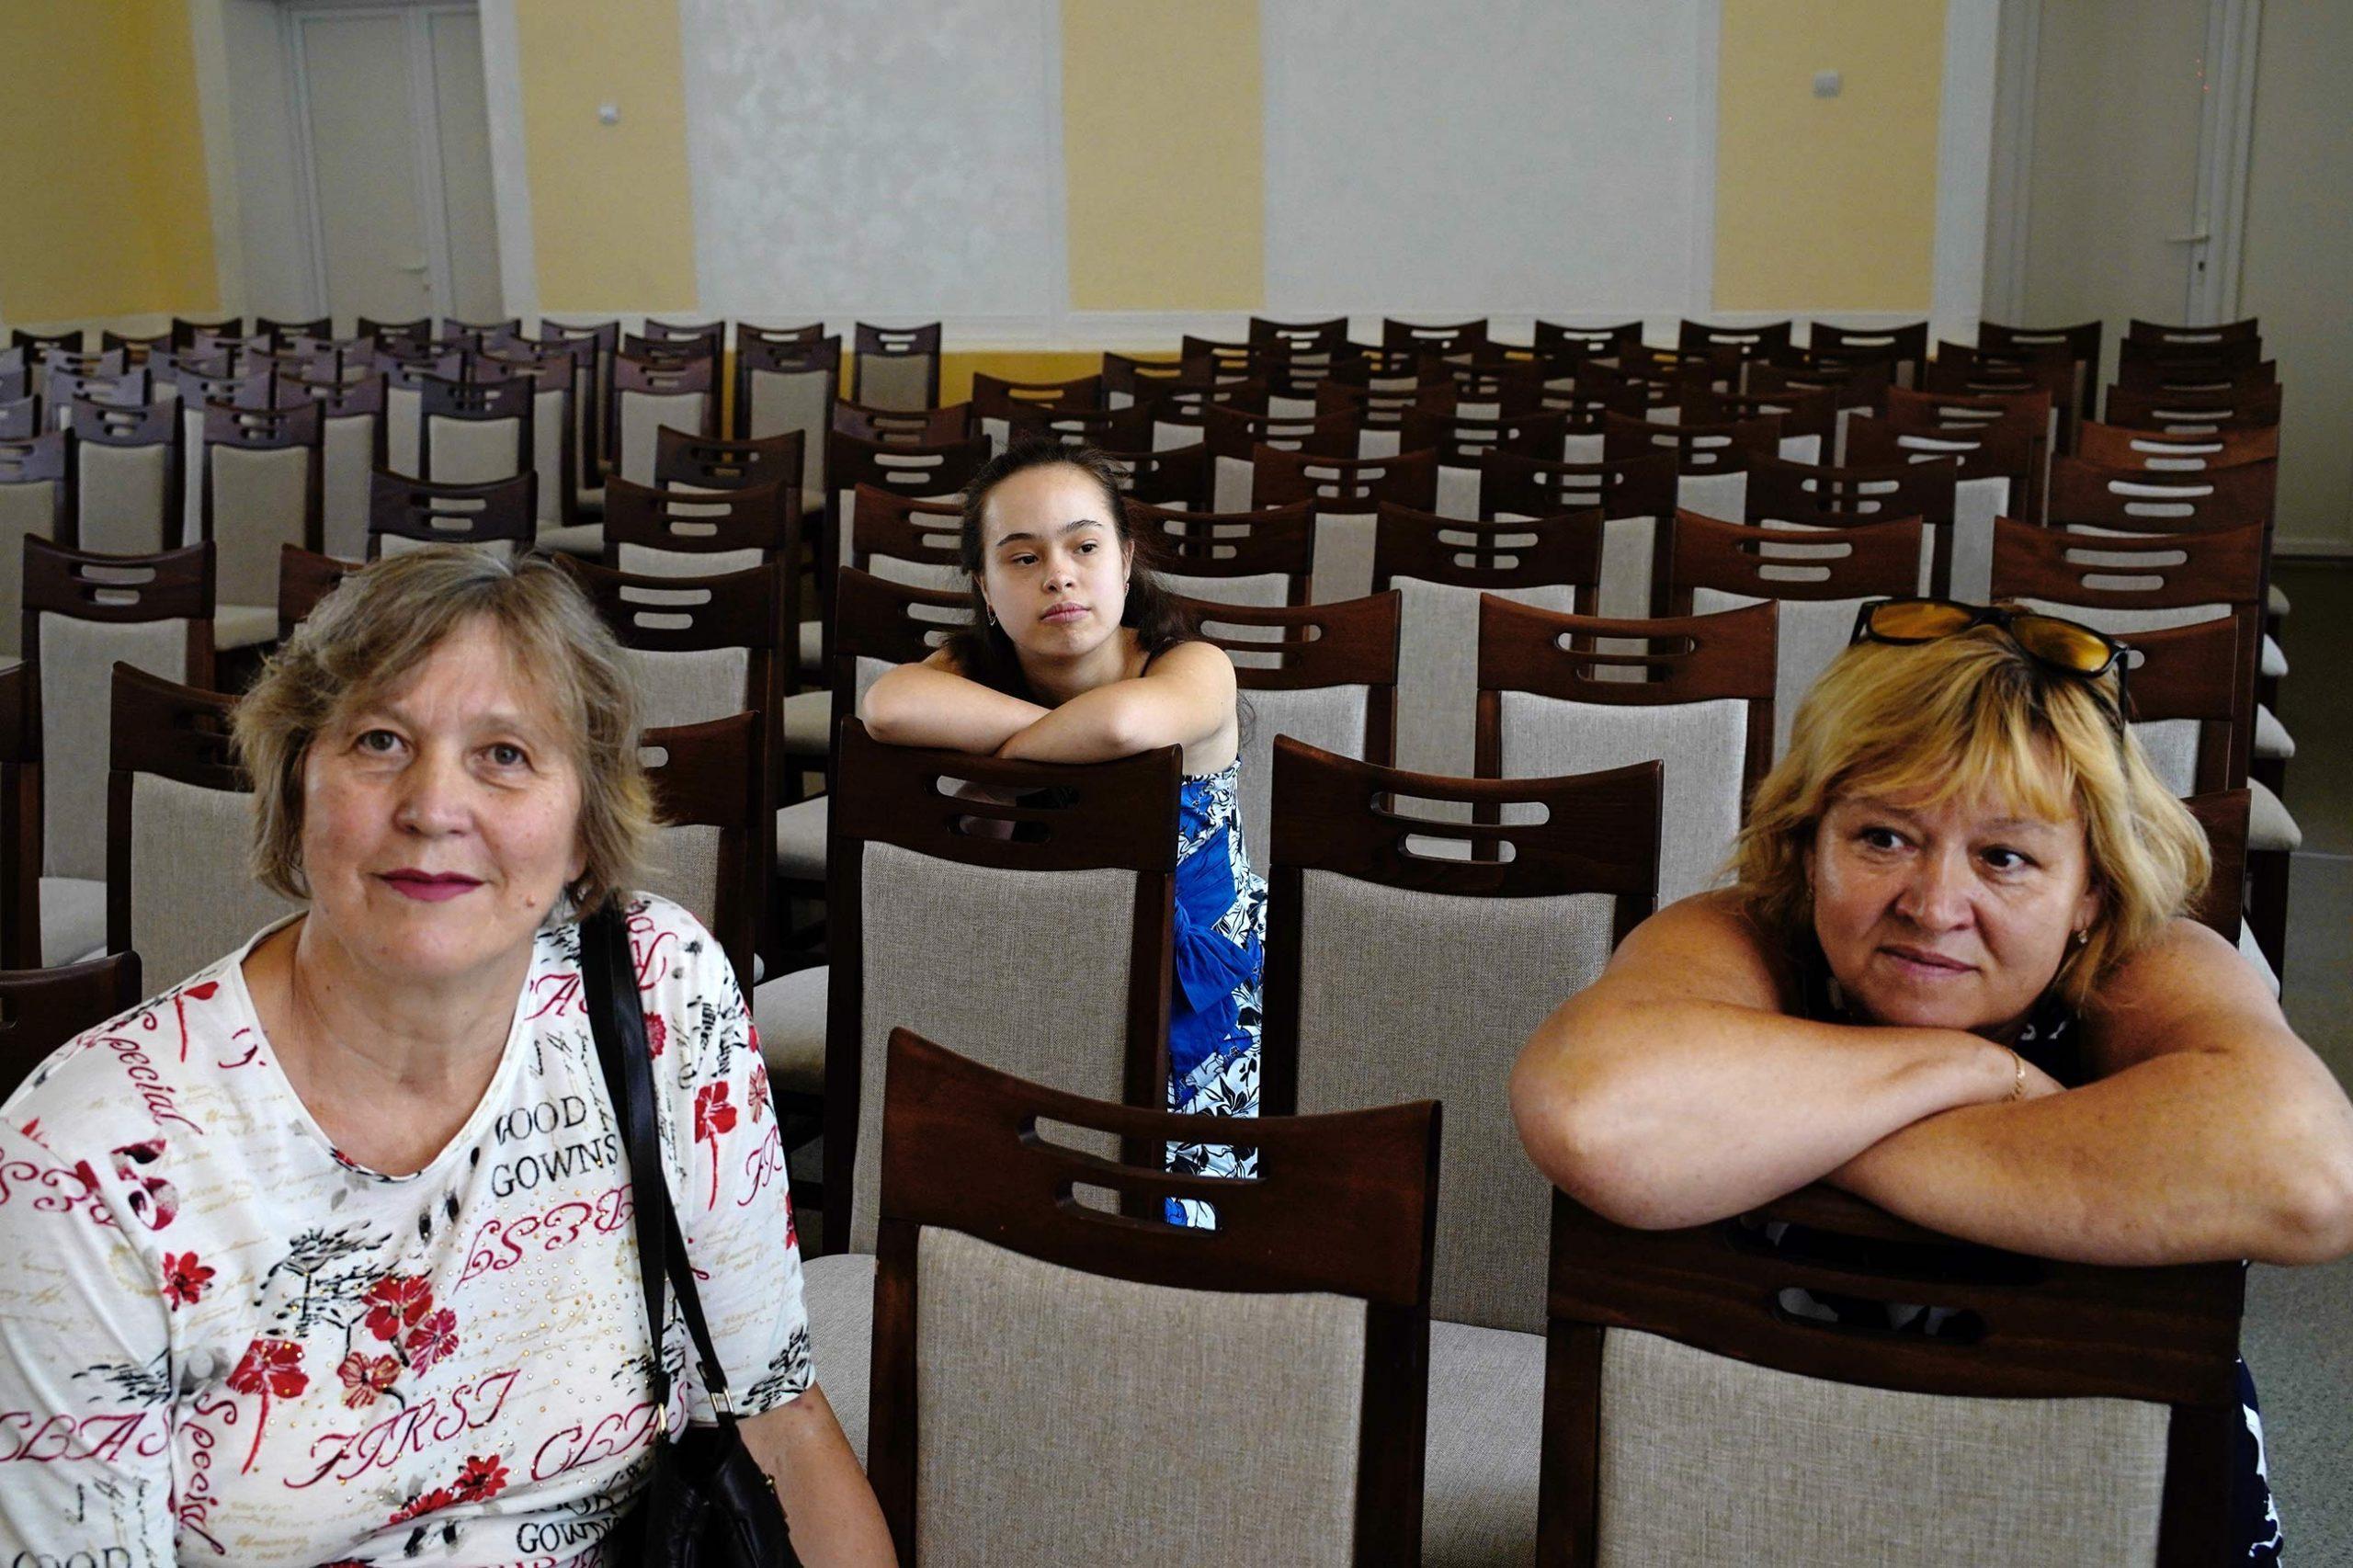 tch7367 scaled - <b>Музыка для Лизы.</b> Как пианистка с синдромом Дауна и ее мама борются за право на образование - Заборона